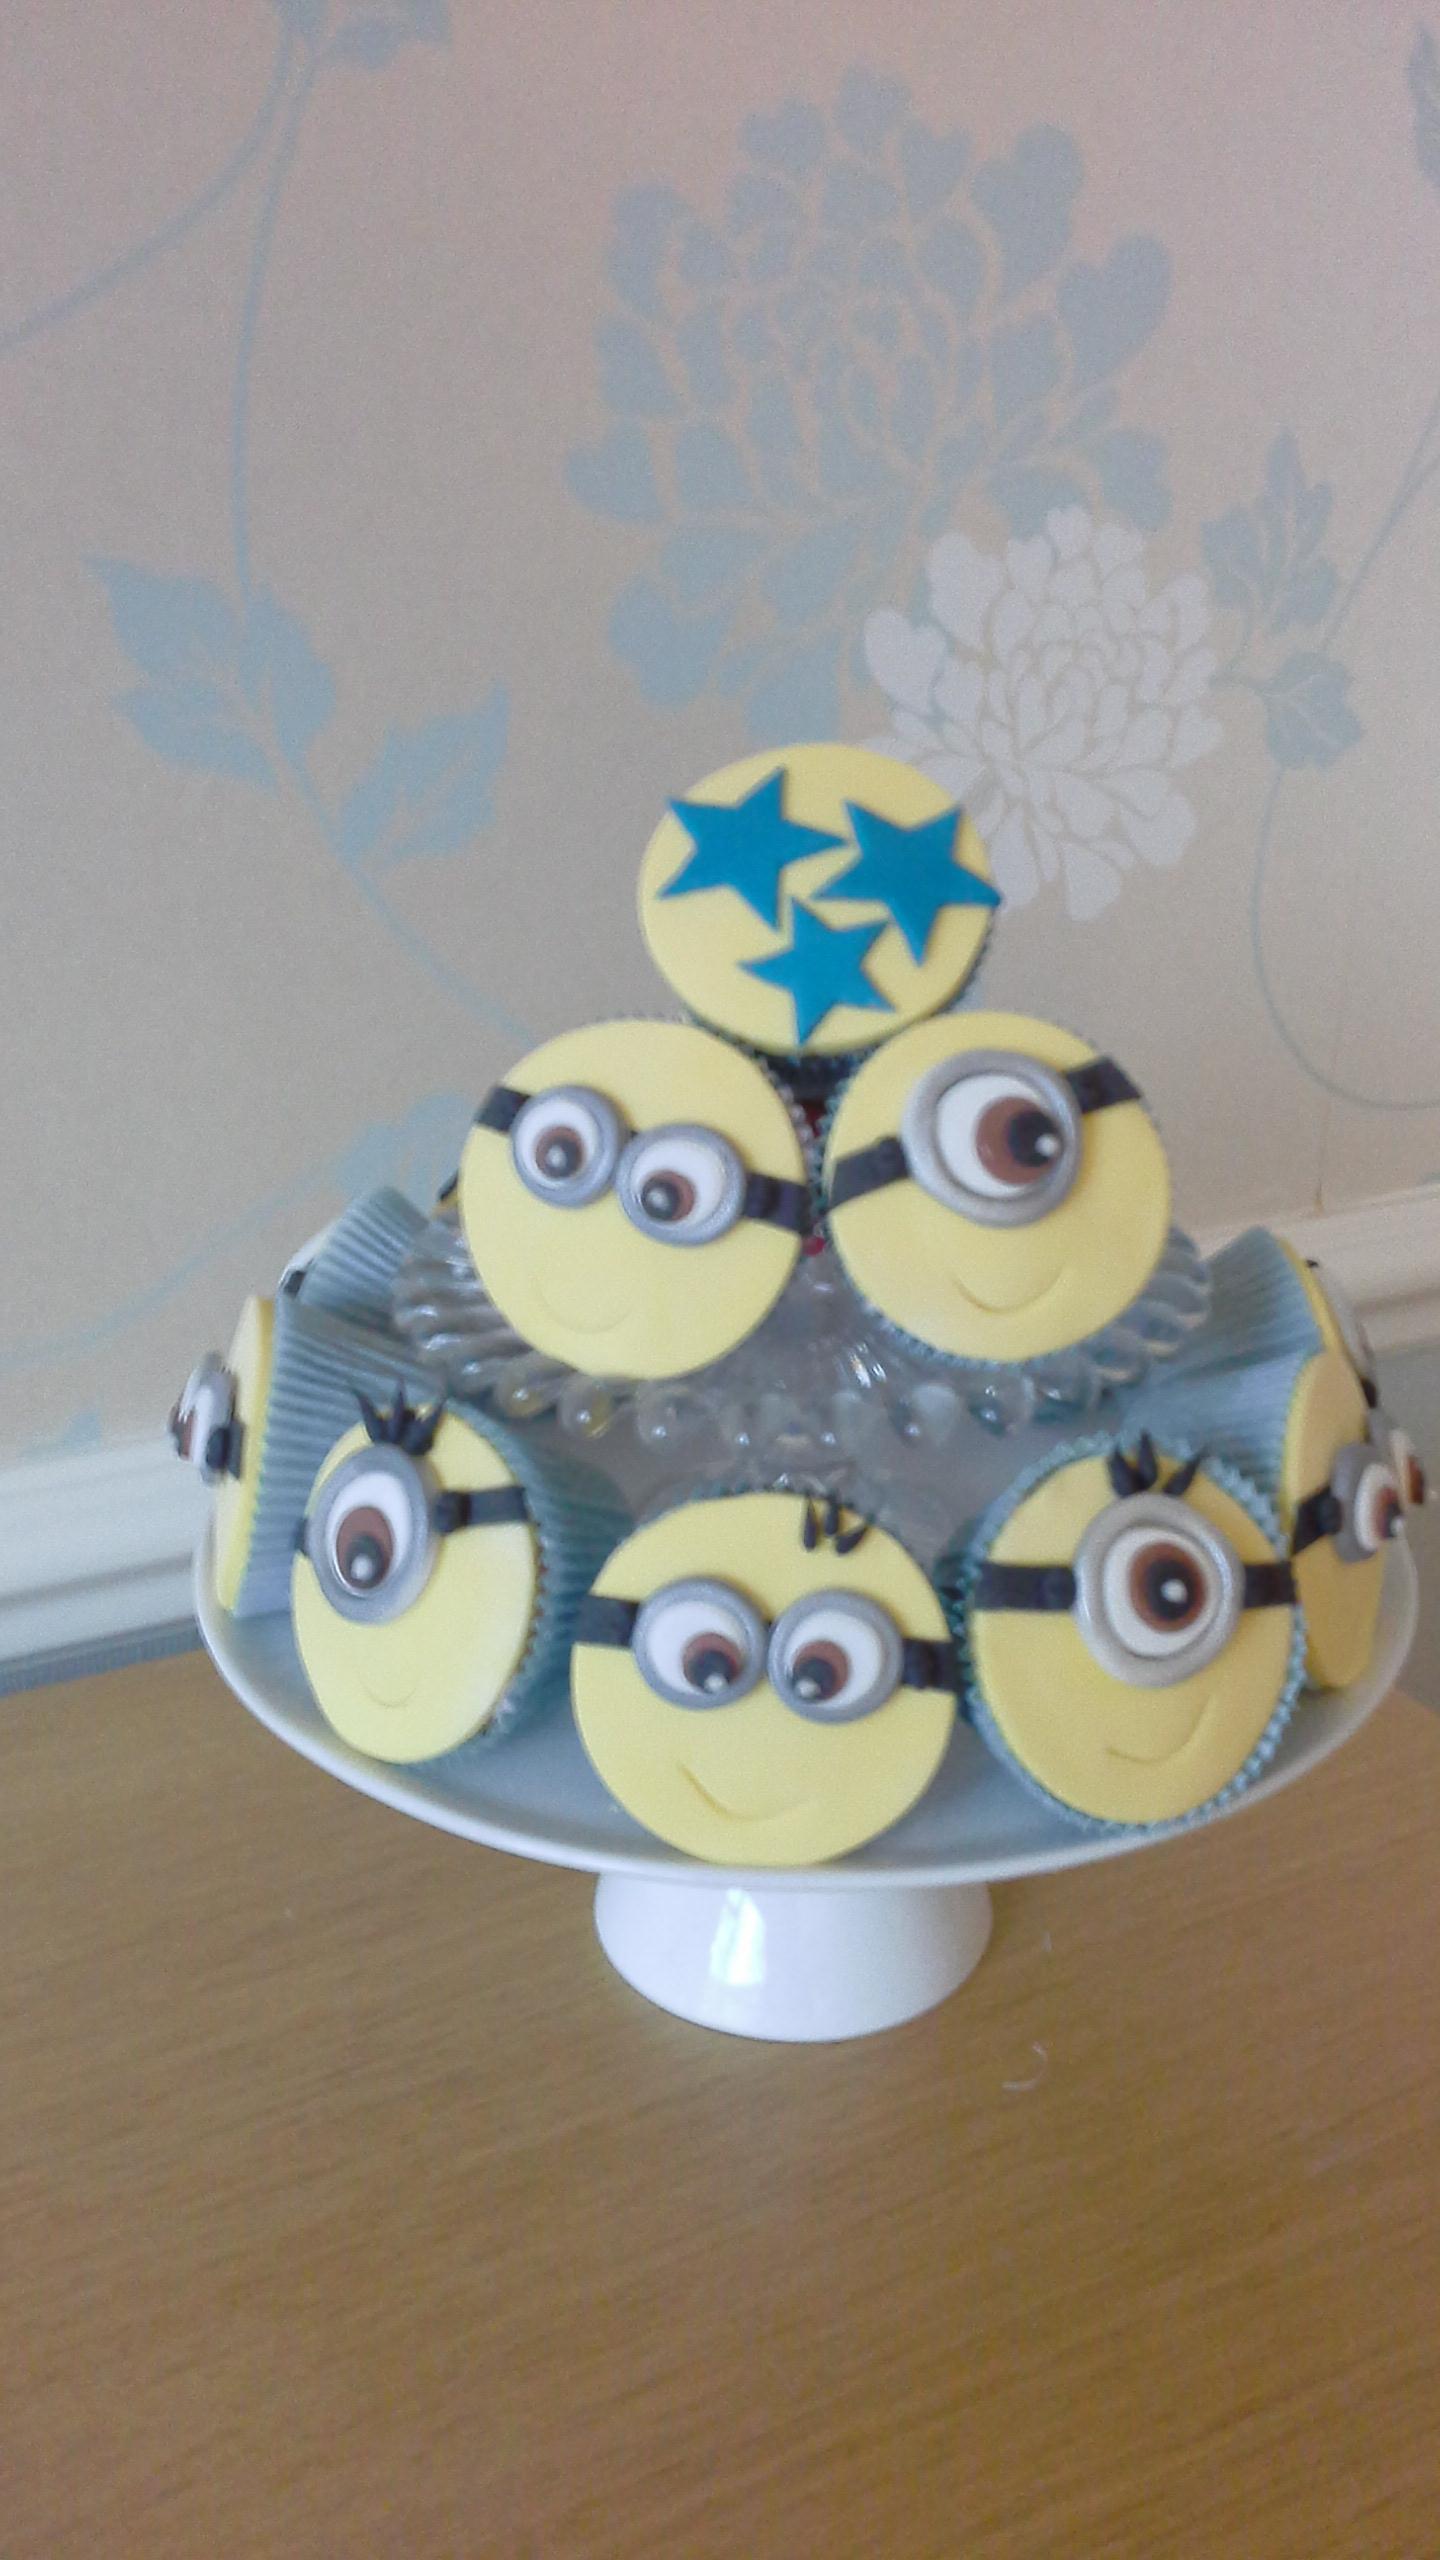 Ough What a Cake 1 Cupcake